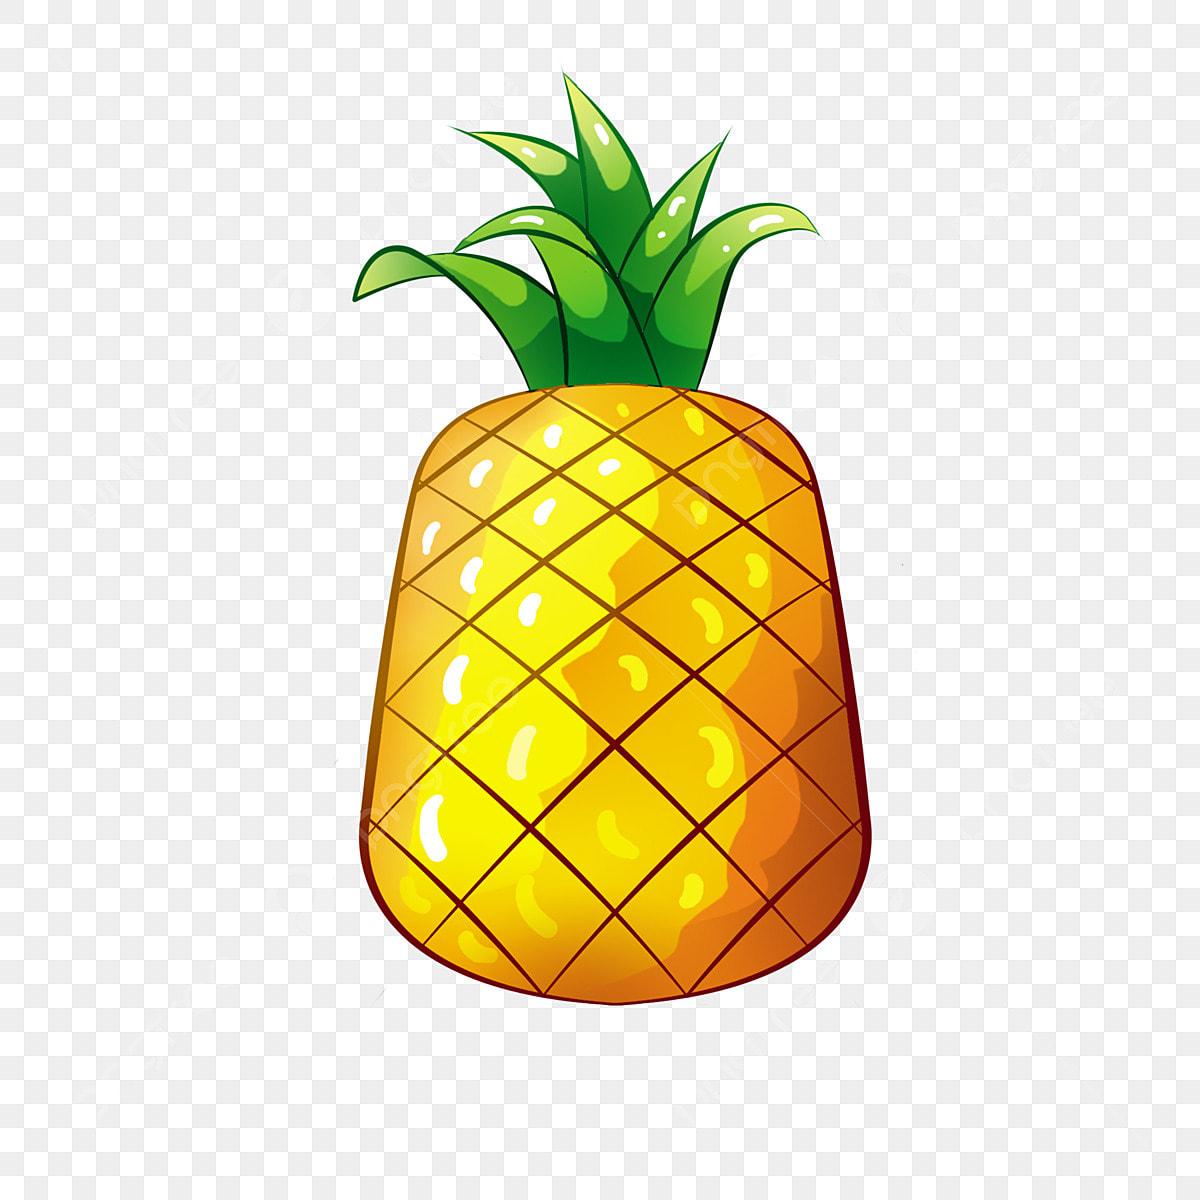 Ananas Rysunek pineapple plant yellow cartoon, pineapple, simple, cartoon